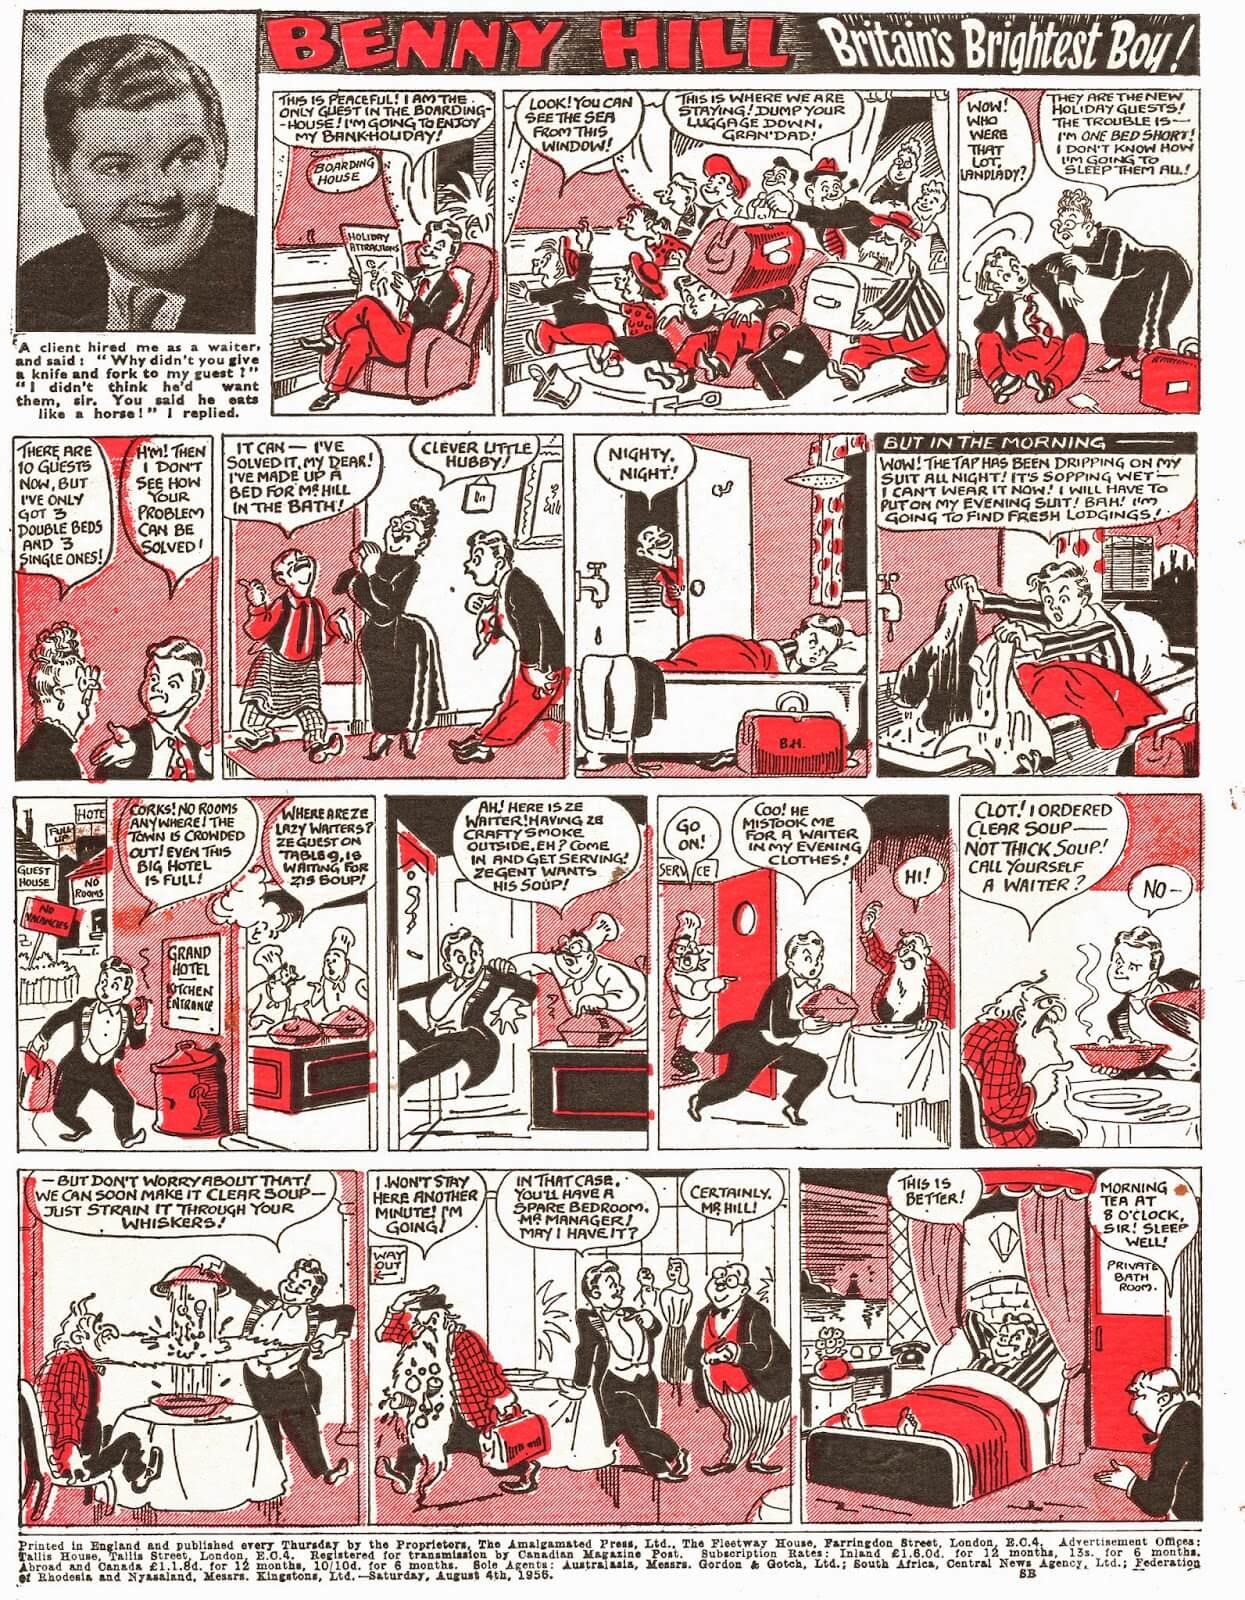 Benny Hill, Britain's Brightest Boy - Film Fun (1956/08/04)